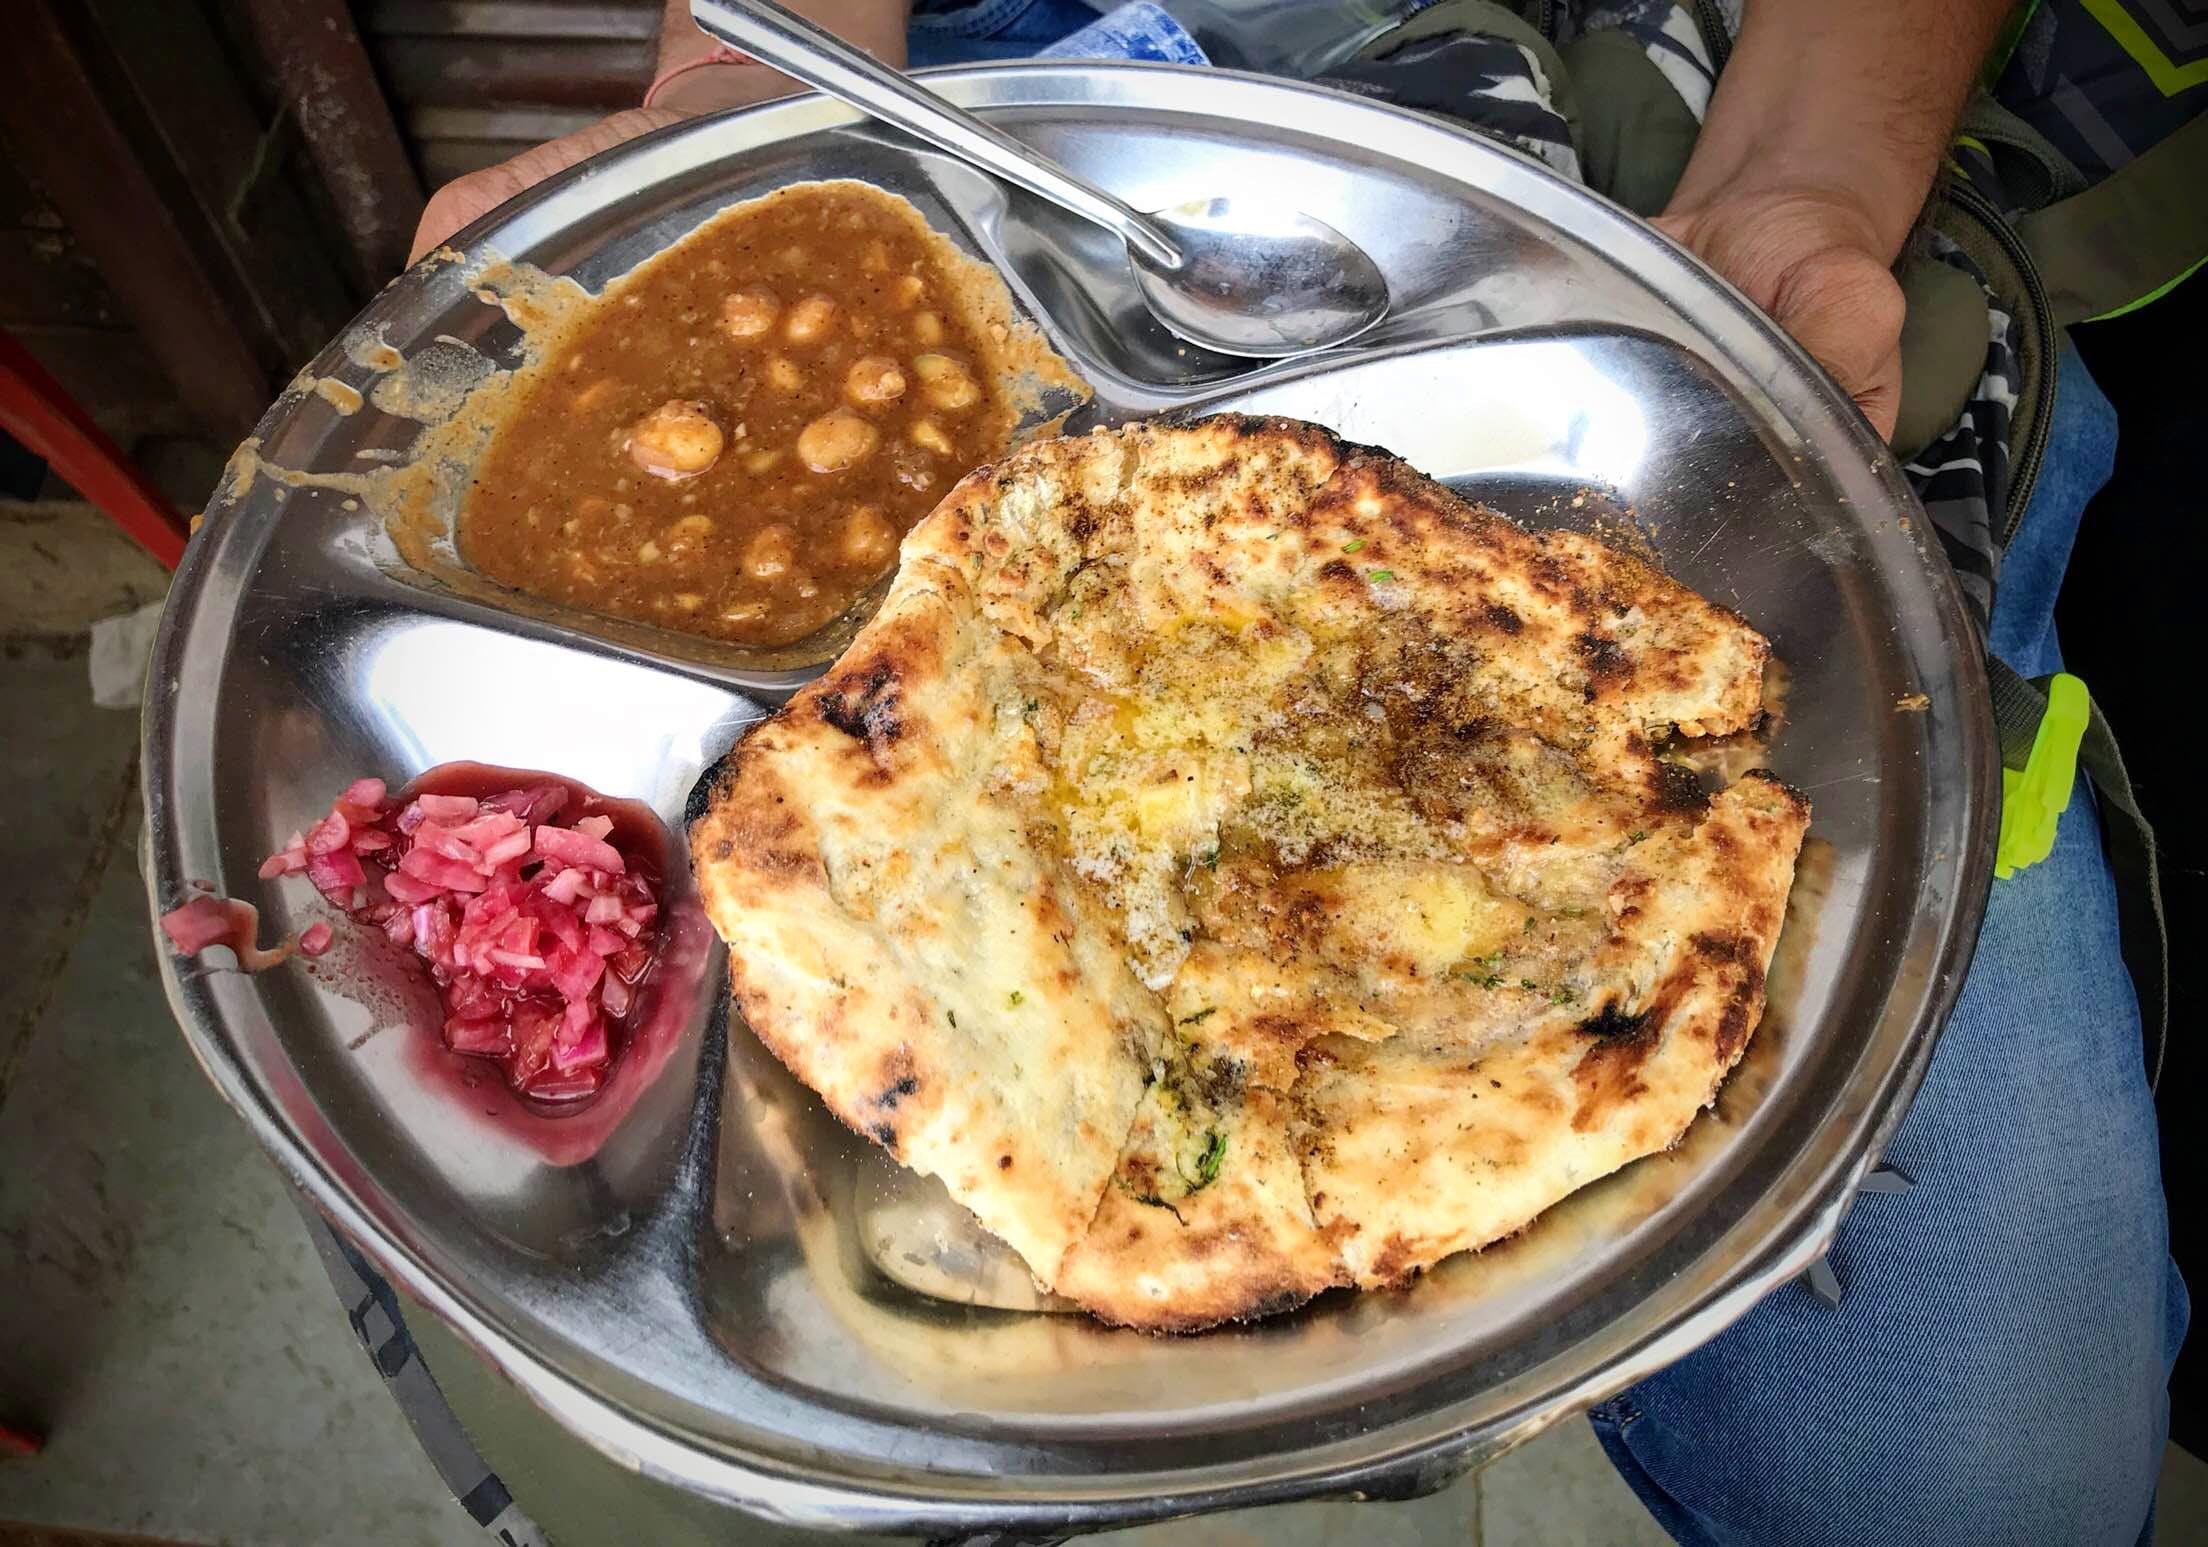 Dish,Food,Cuisine,Ingredient,Naan,Baked goods,Staple food,Flatbread,Produce,Indian cuisine